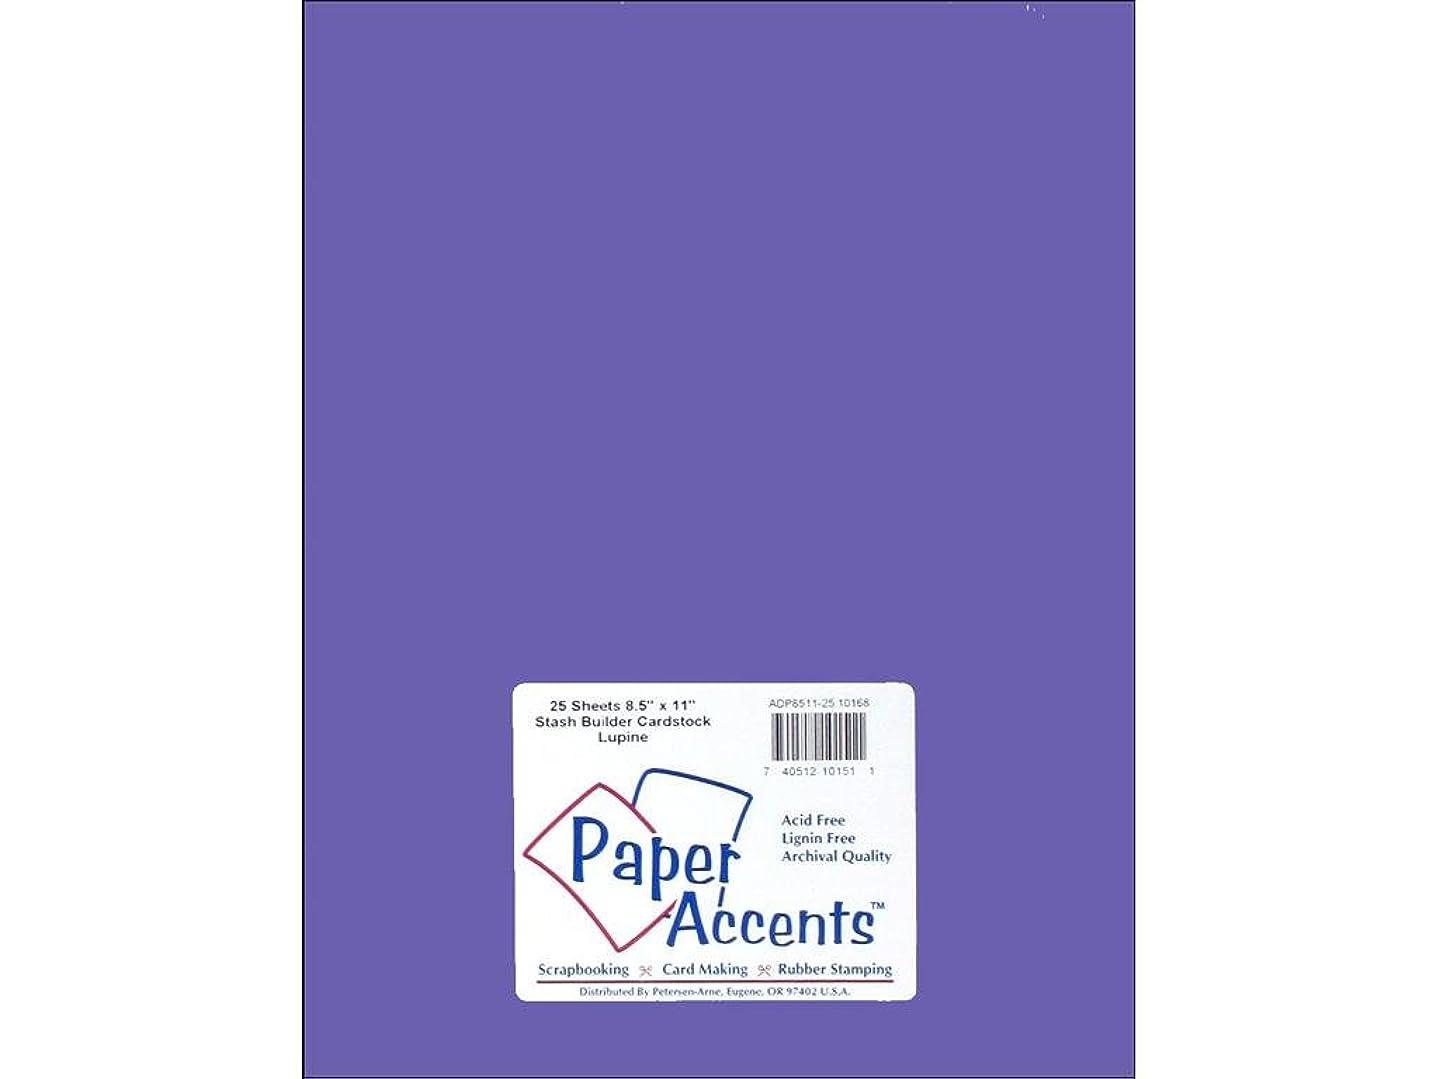 Accent Design Paper Accents StashBuilder8.5x11Lupine Cdstk Stash Builder 8.5x11 60# Lupine